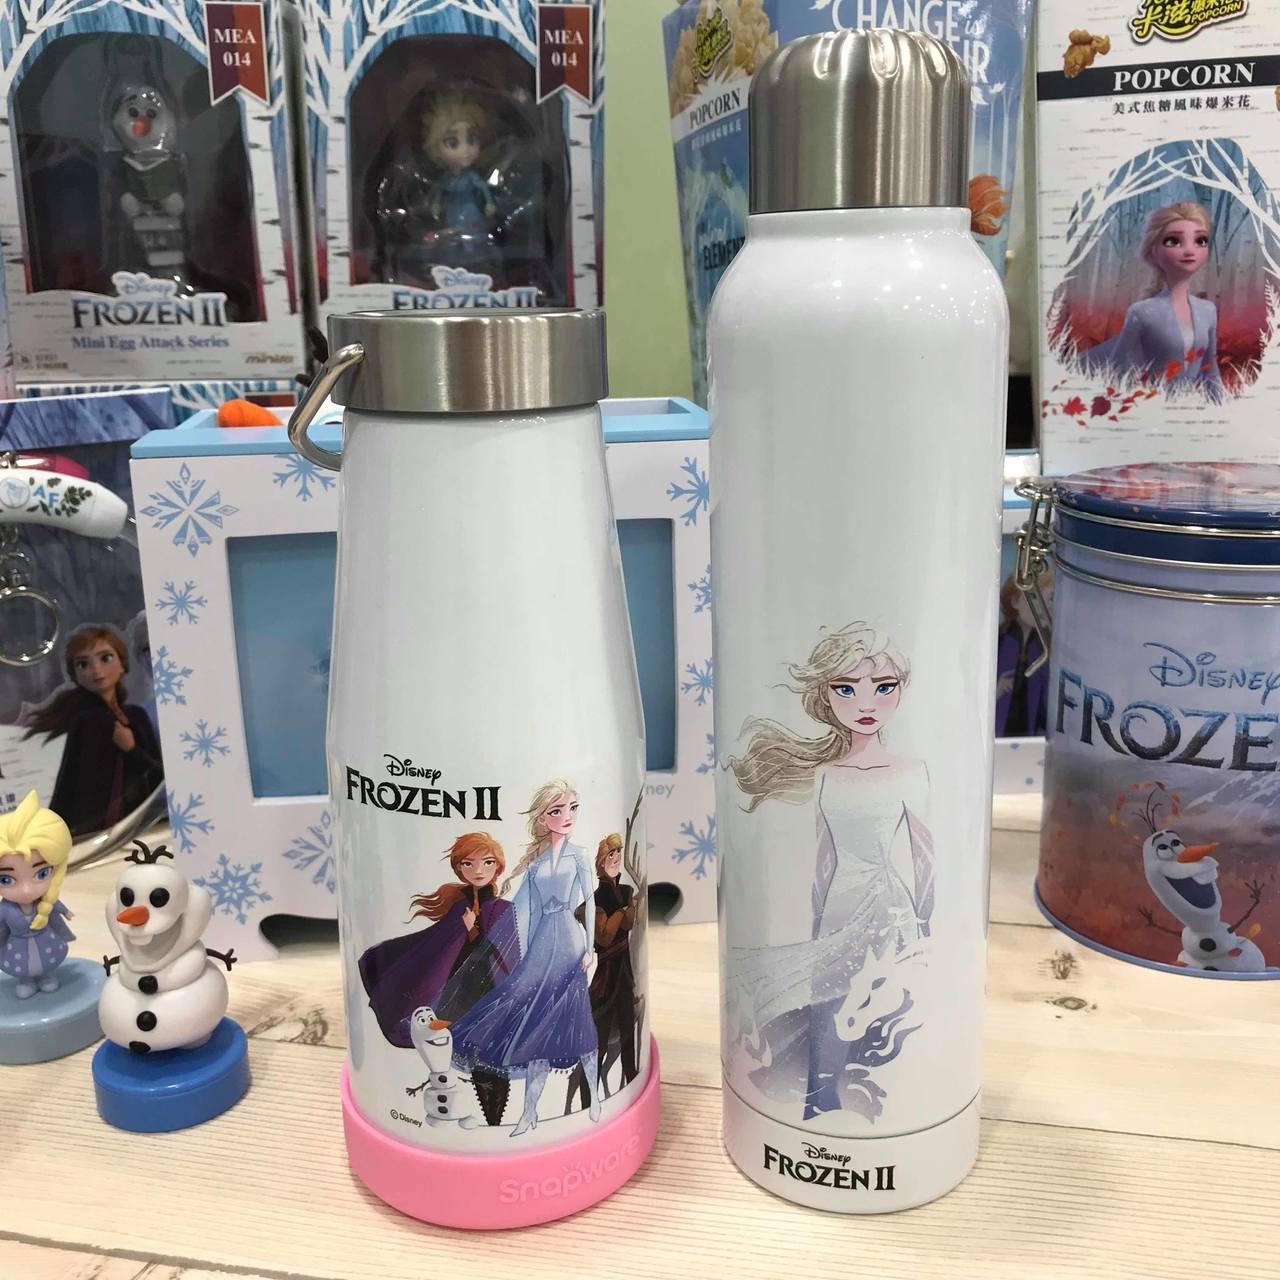 ibon mart開賣的康寧Snapware冰雪奇緣超真空不鏽鋼保溫杯380ml...